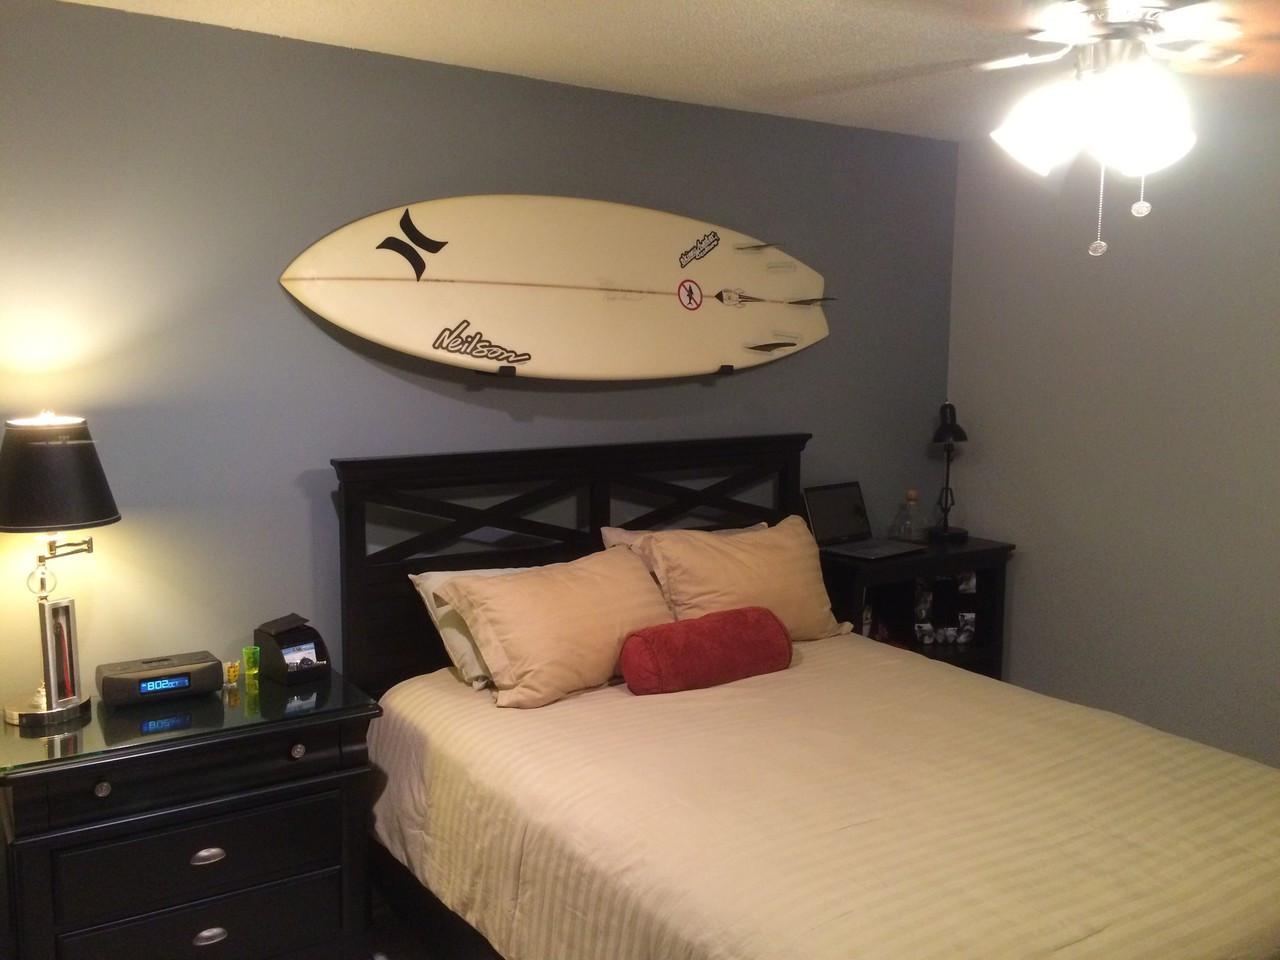 Naked surf minimalist surfboard rack storeyourboard bedroom surfboard rack amipublicfo Images